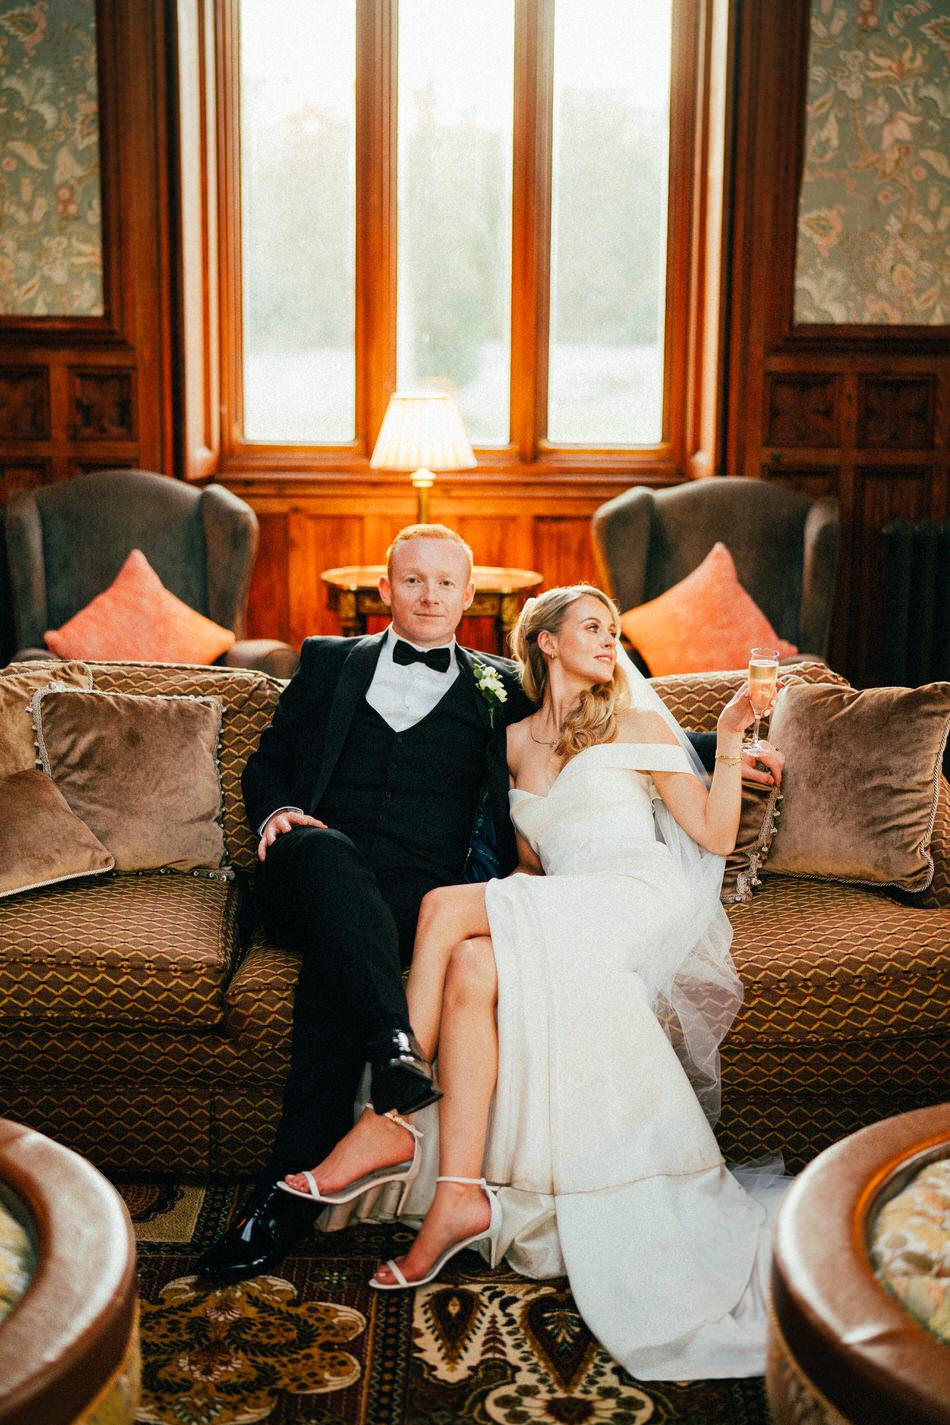 Castle-wedding-ireland-photos- 0234 174